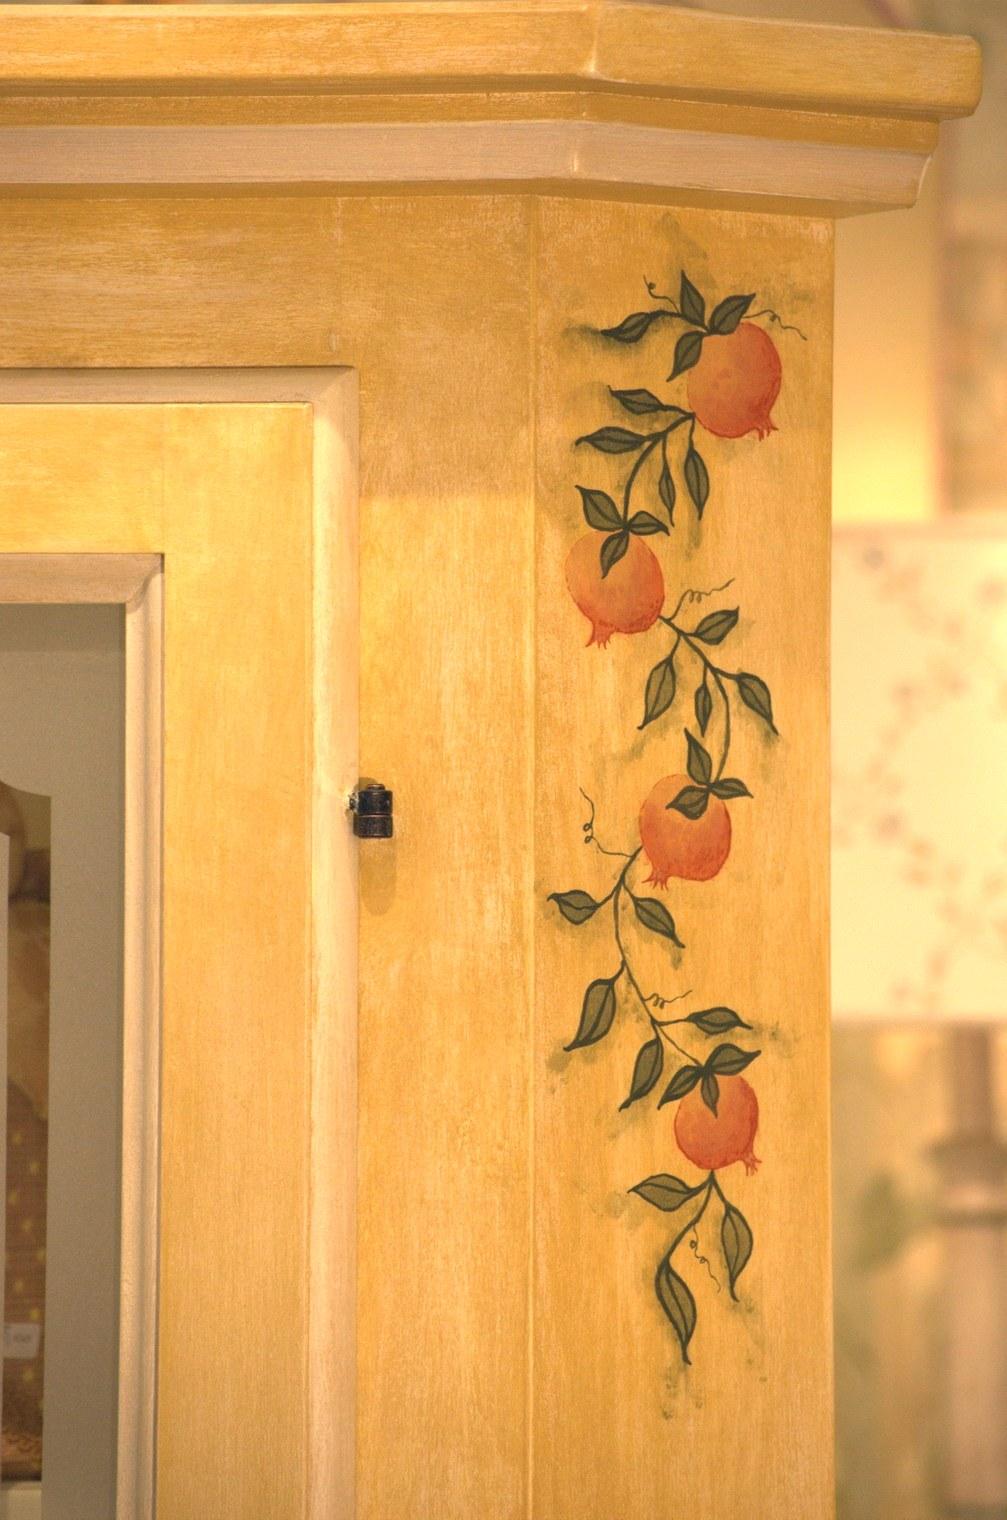 mobili decorati a mano a Trieste  studio dinterni gtf